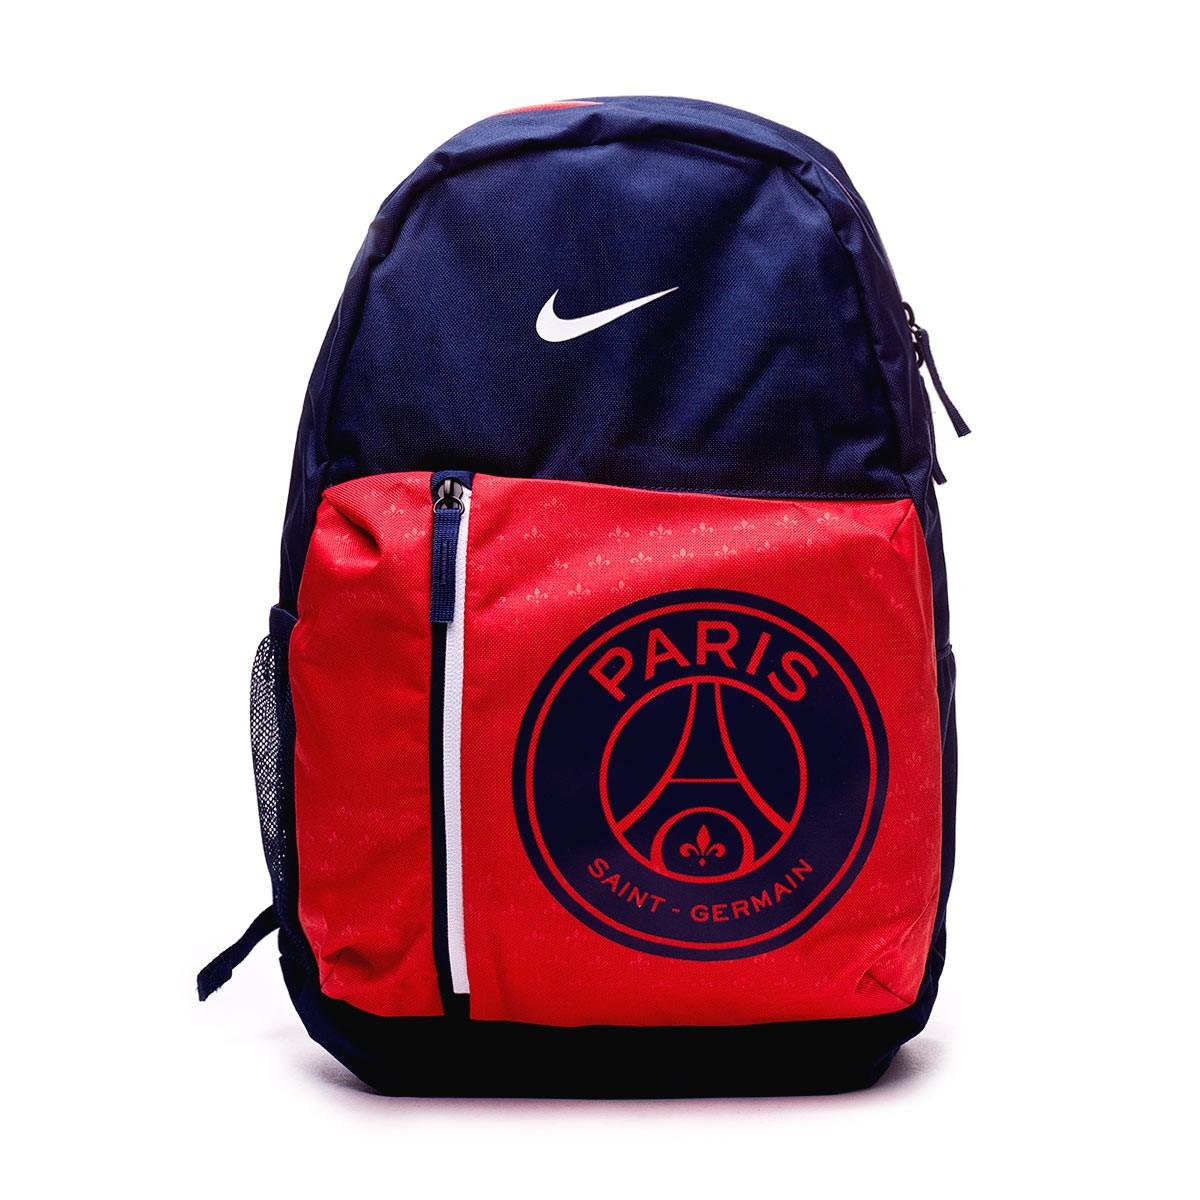 2cf0bf8d44337 Mochila Nike Paris Saint-Germain Stadium 2018-2019 Midnight navy-Challenge  red-White - Tienda de fútbol Fútbol Emotion